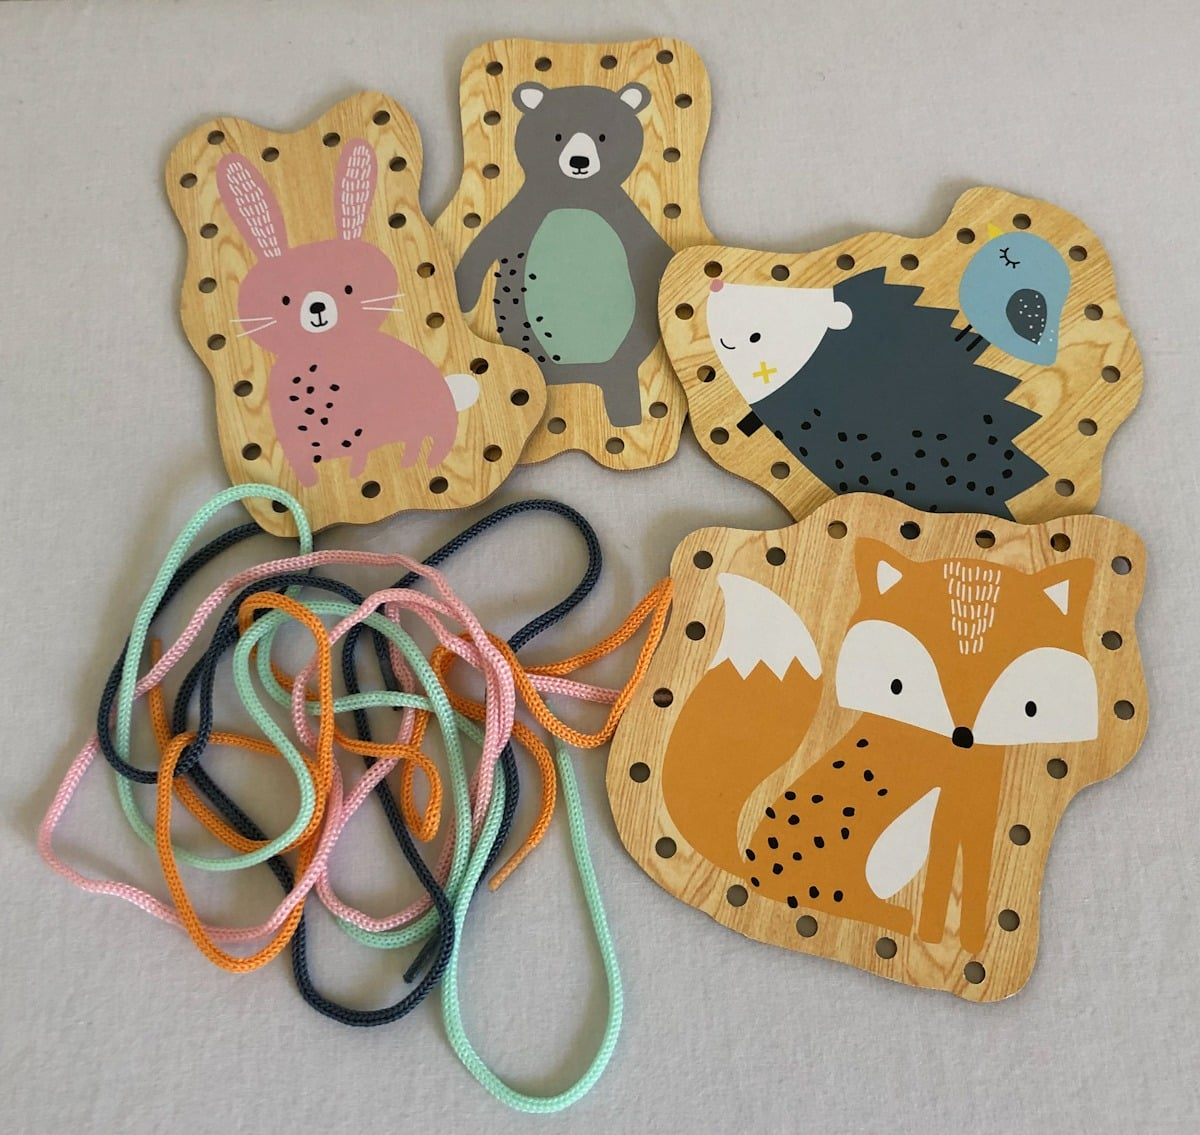 Lacing & Threading Animal Boards